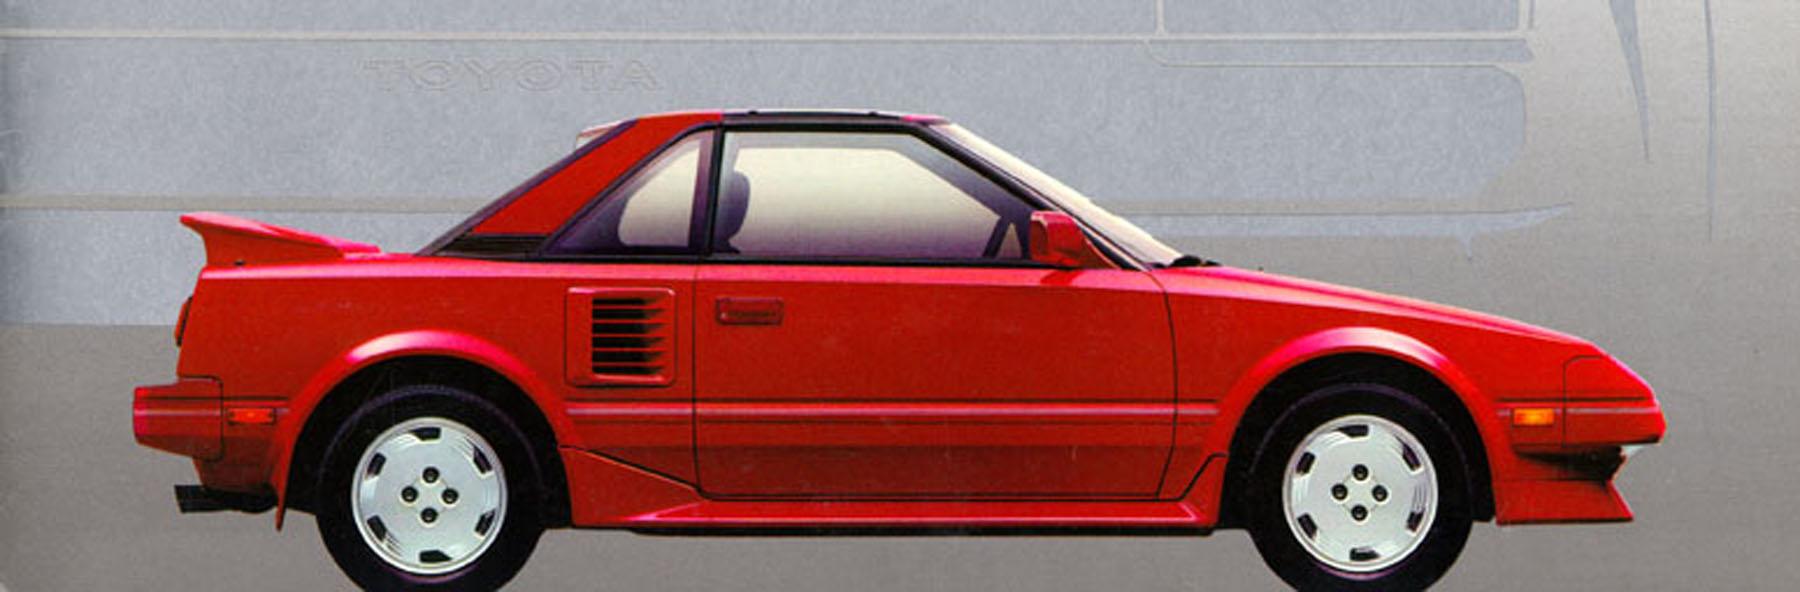 1989 Toyota MR2 side profile